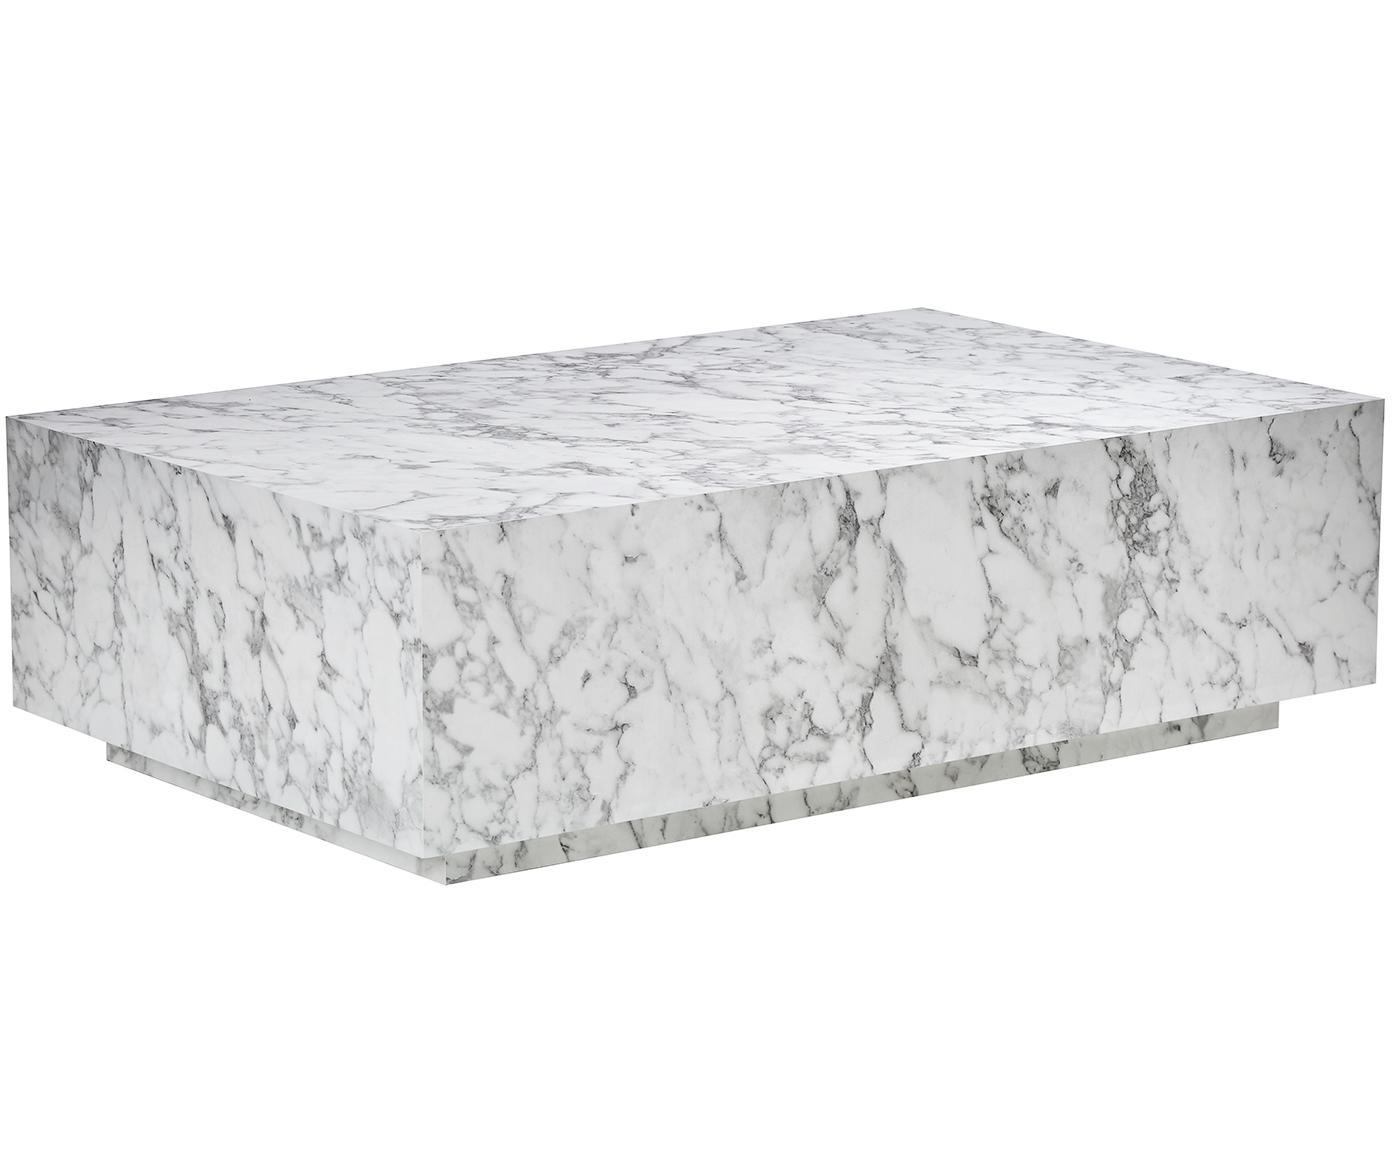 Zwevende salontafel Lesley met marmerlook, MDF bekleed met melaminefolie, Wit, gemarmerd, glanzend, B 120 x D 75 cm